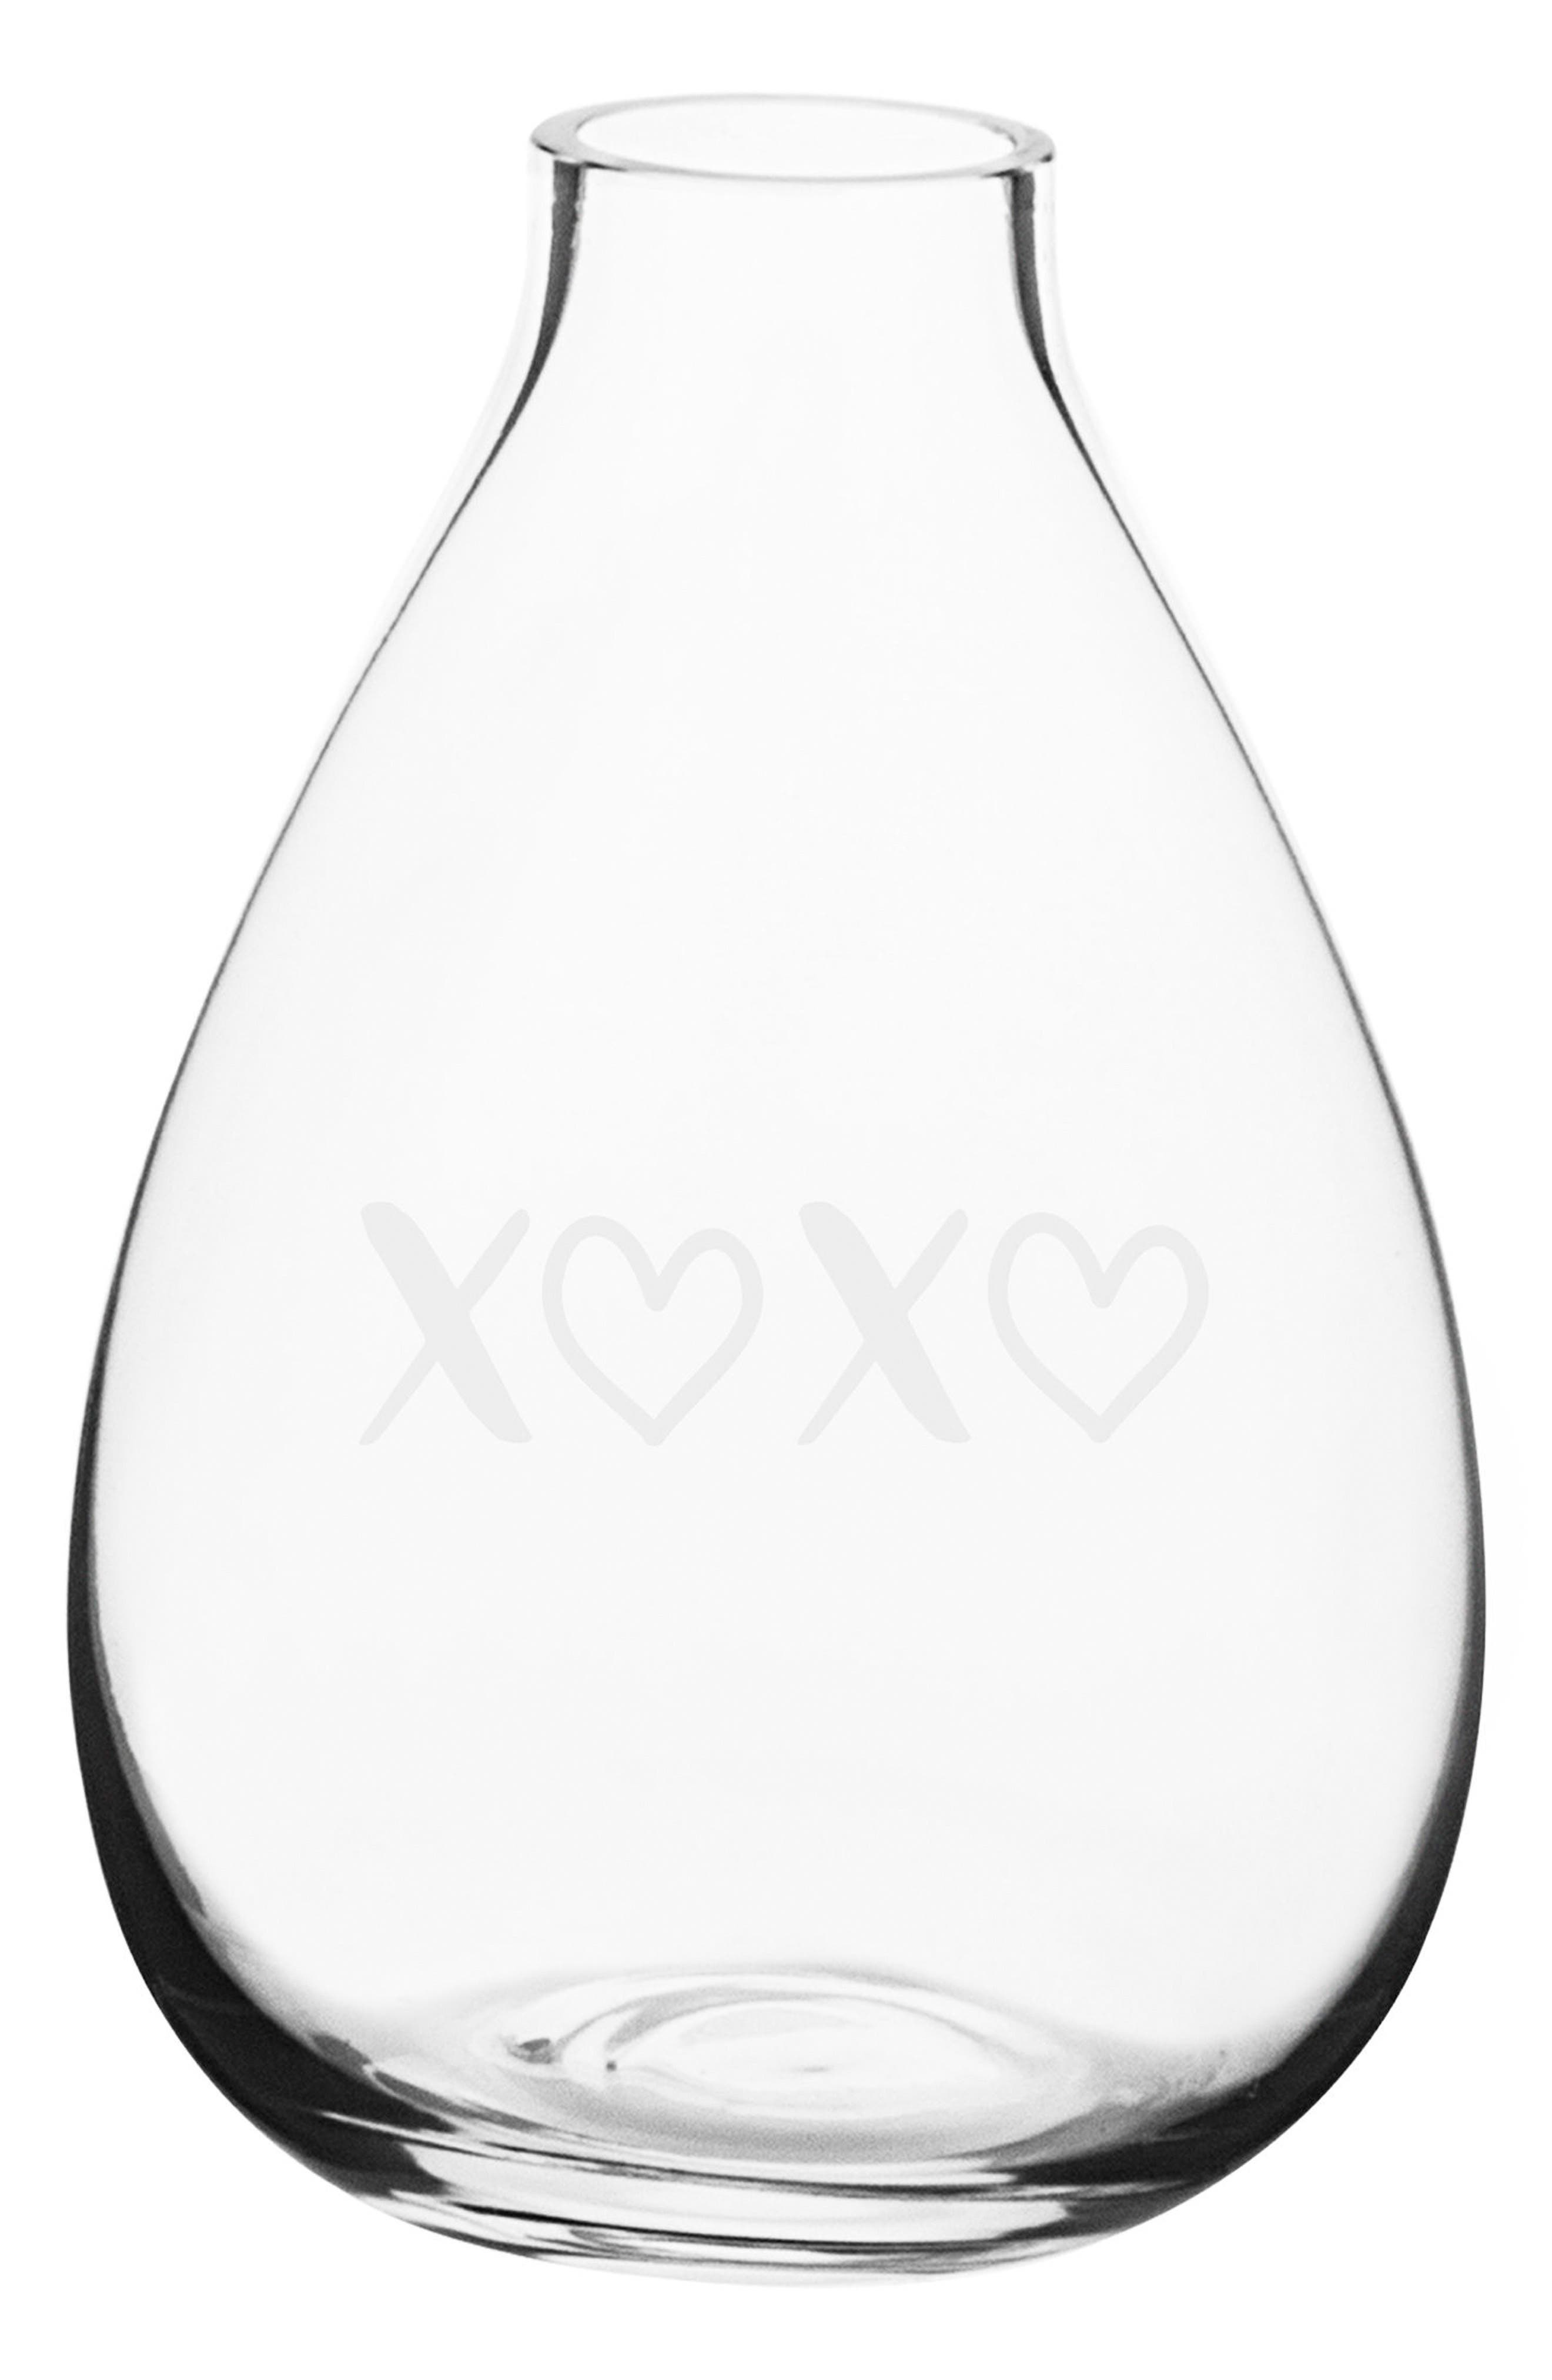 XOXO Glass Vase,                         Main,                         color, 100